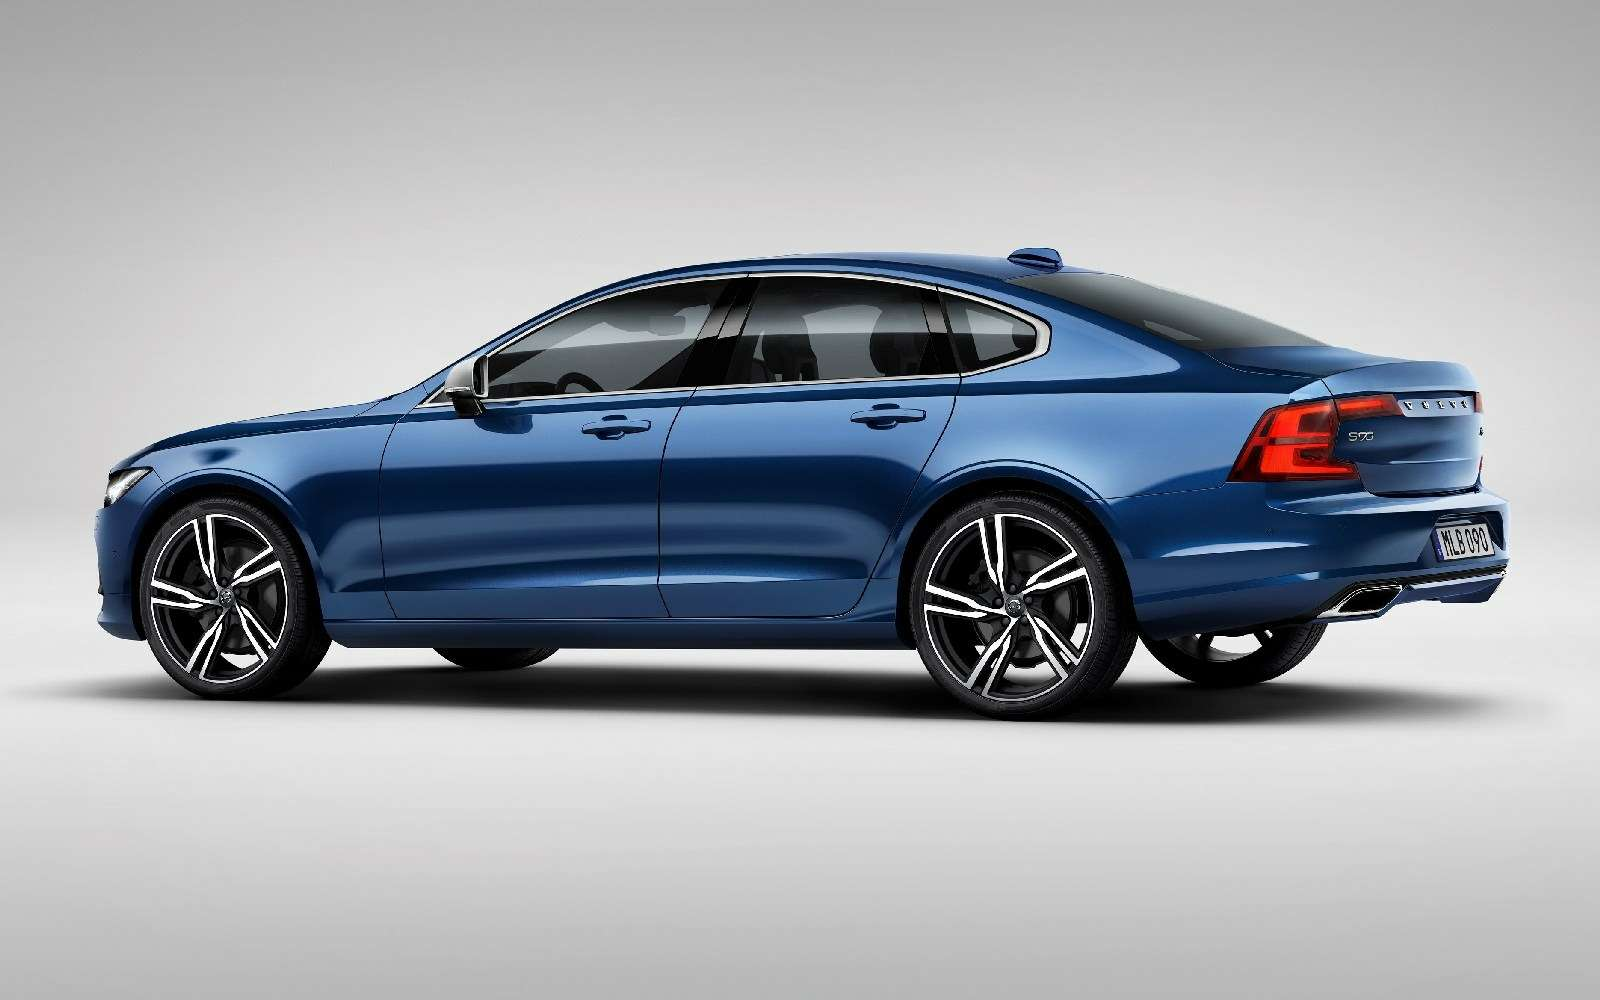 Volvo подготовила дляфлагманской модели спортпакет R-Design— фото 600920